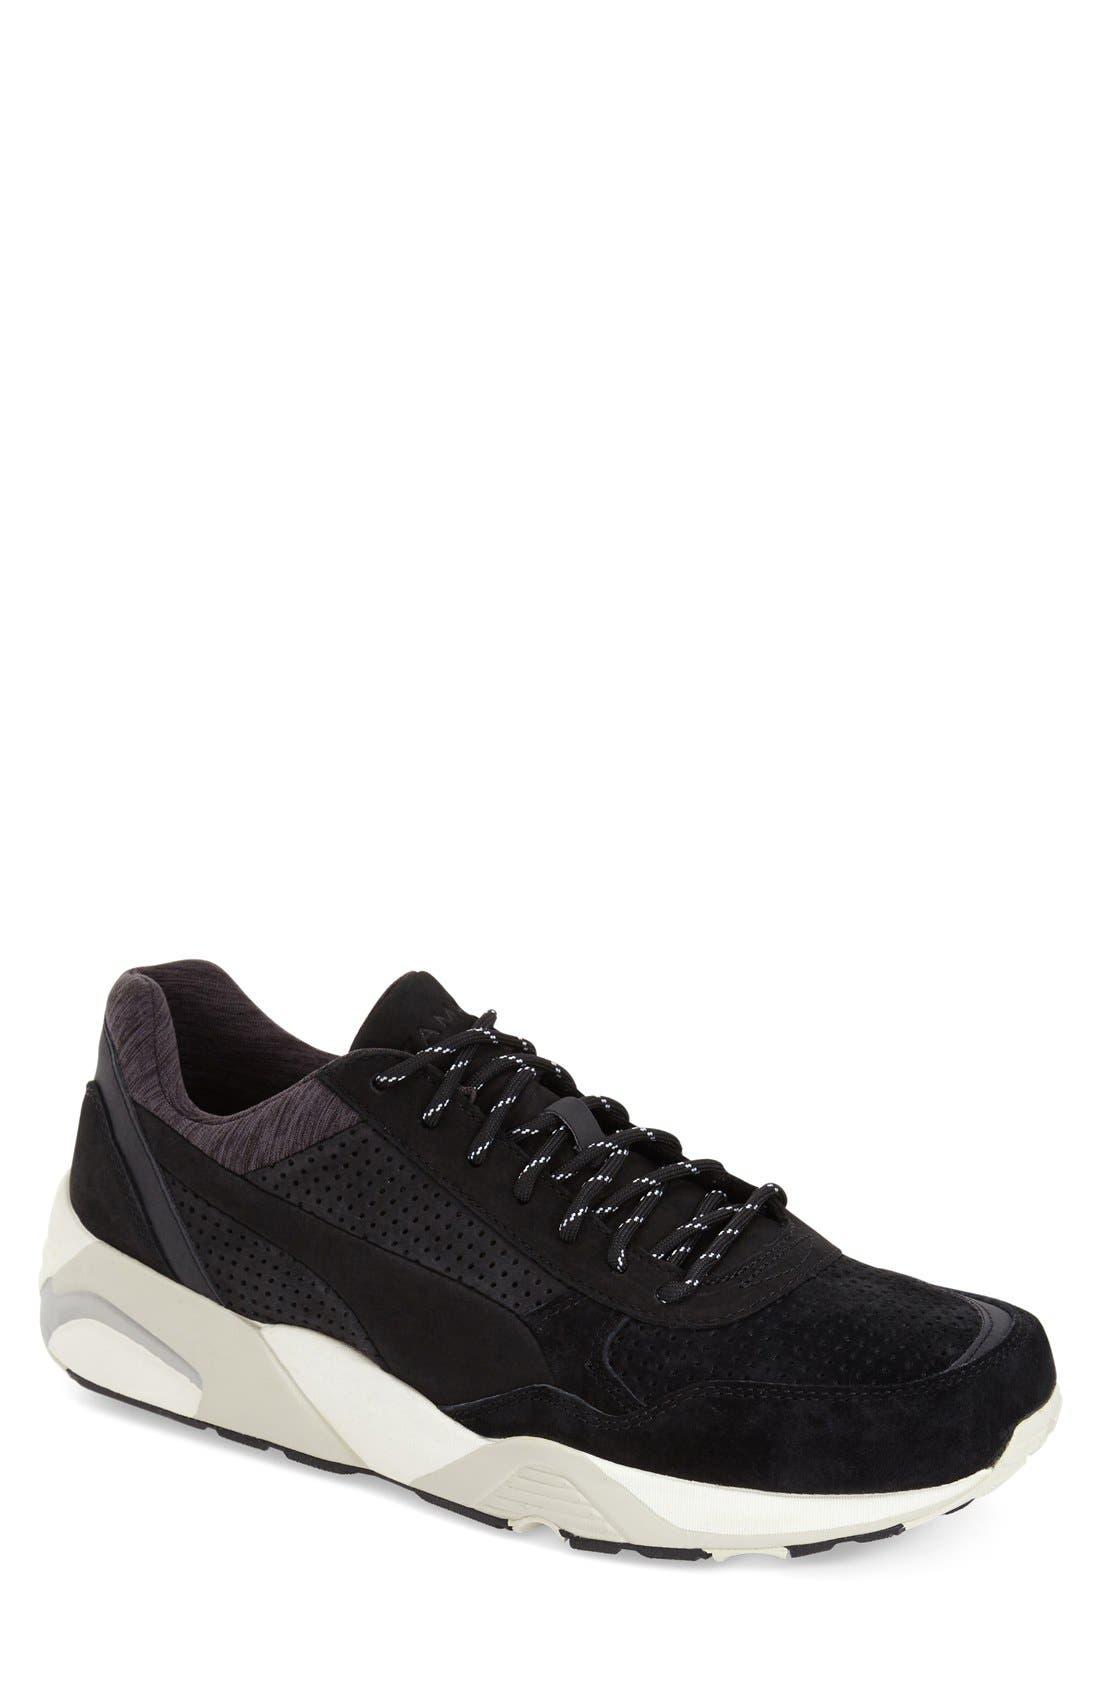 'R698 X STAMPD' Sneaker,                             Main thumbnail 1, color,                             Black